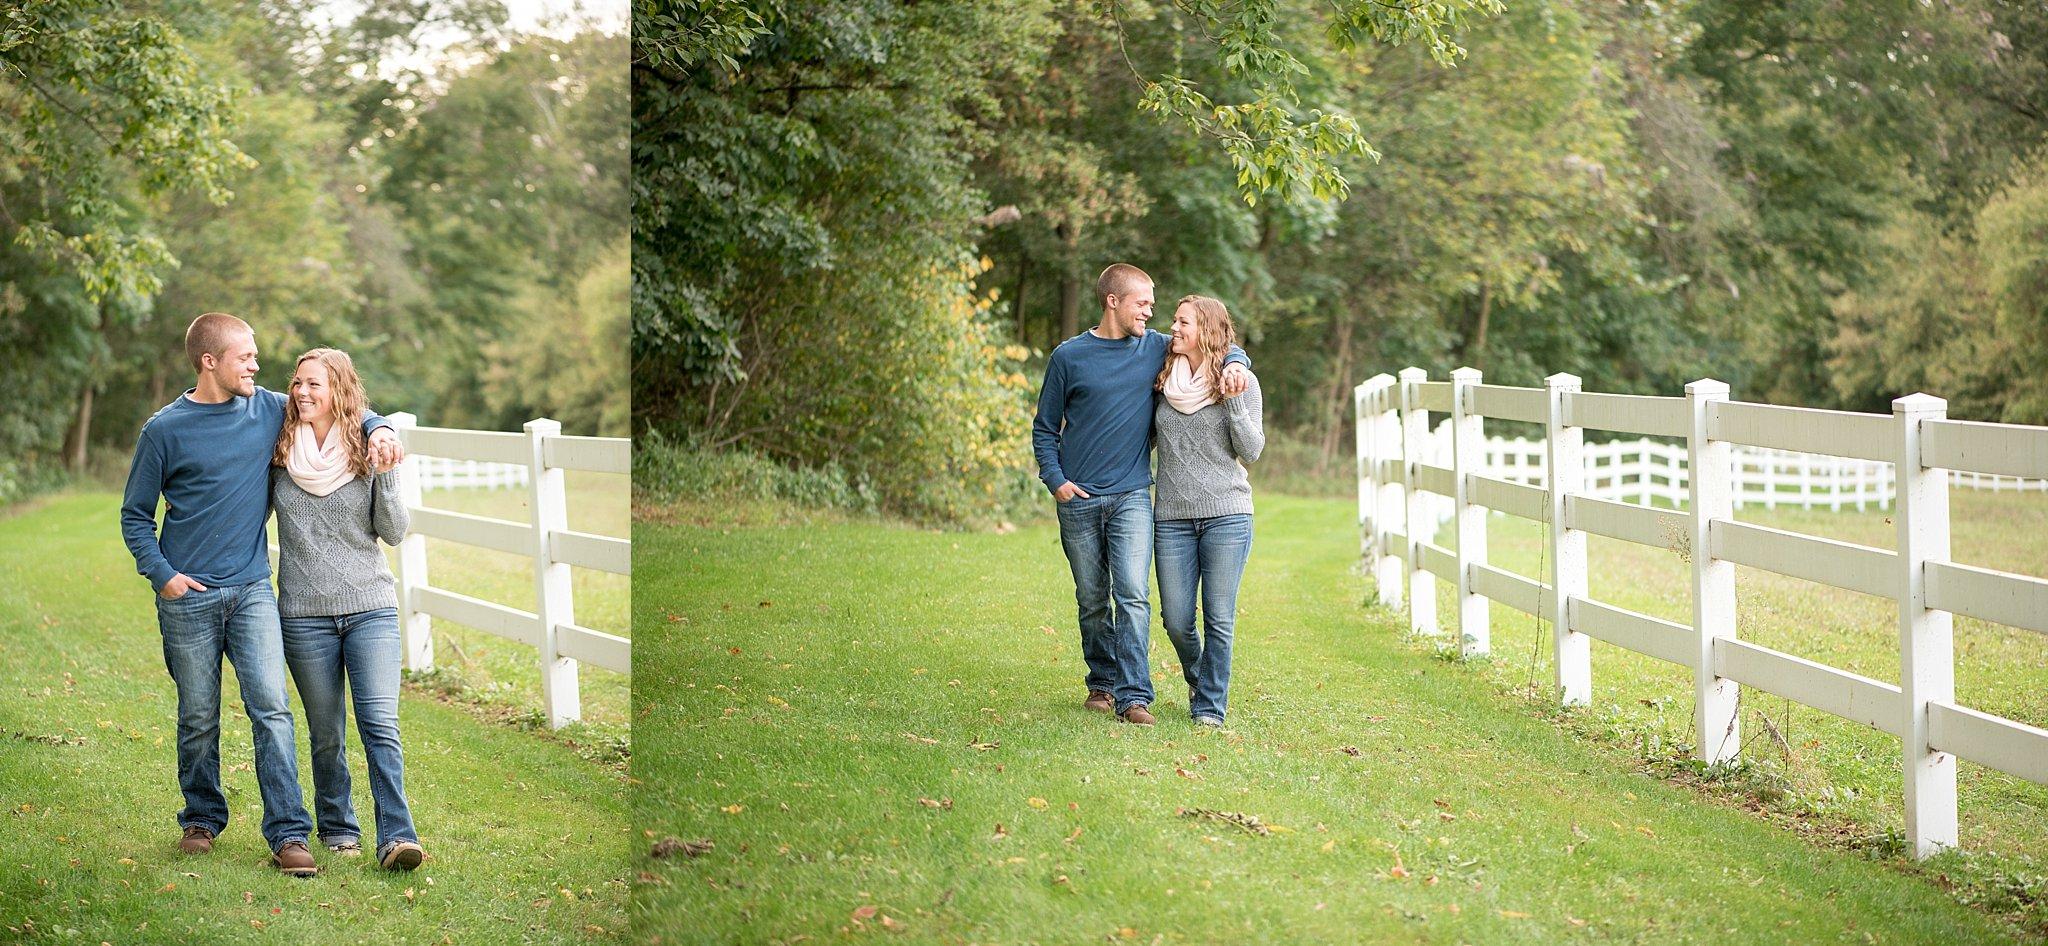 Shallowbrook Farm engagement session Lancaster PA wedding photography photo